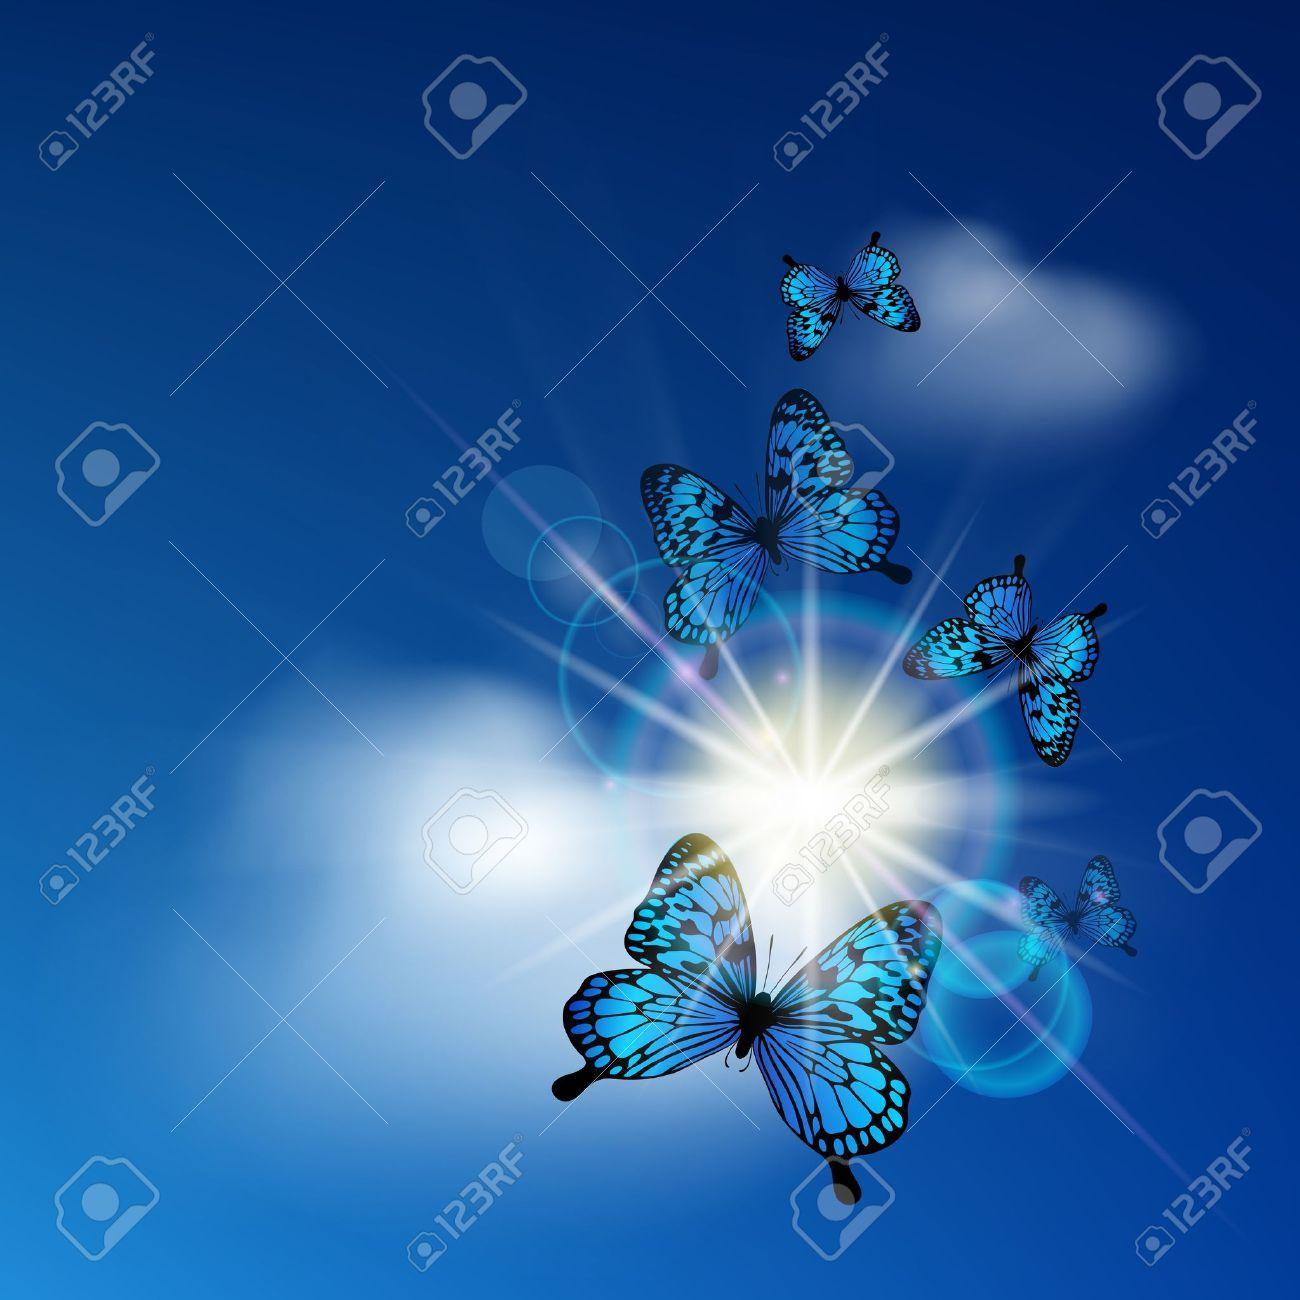 Blue butterflies flying against the solar sky - 13172654